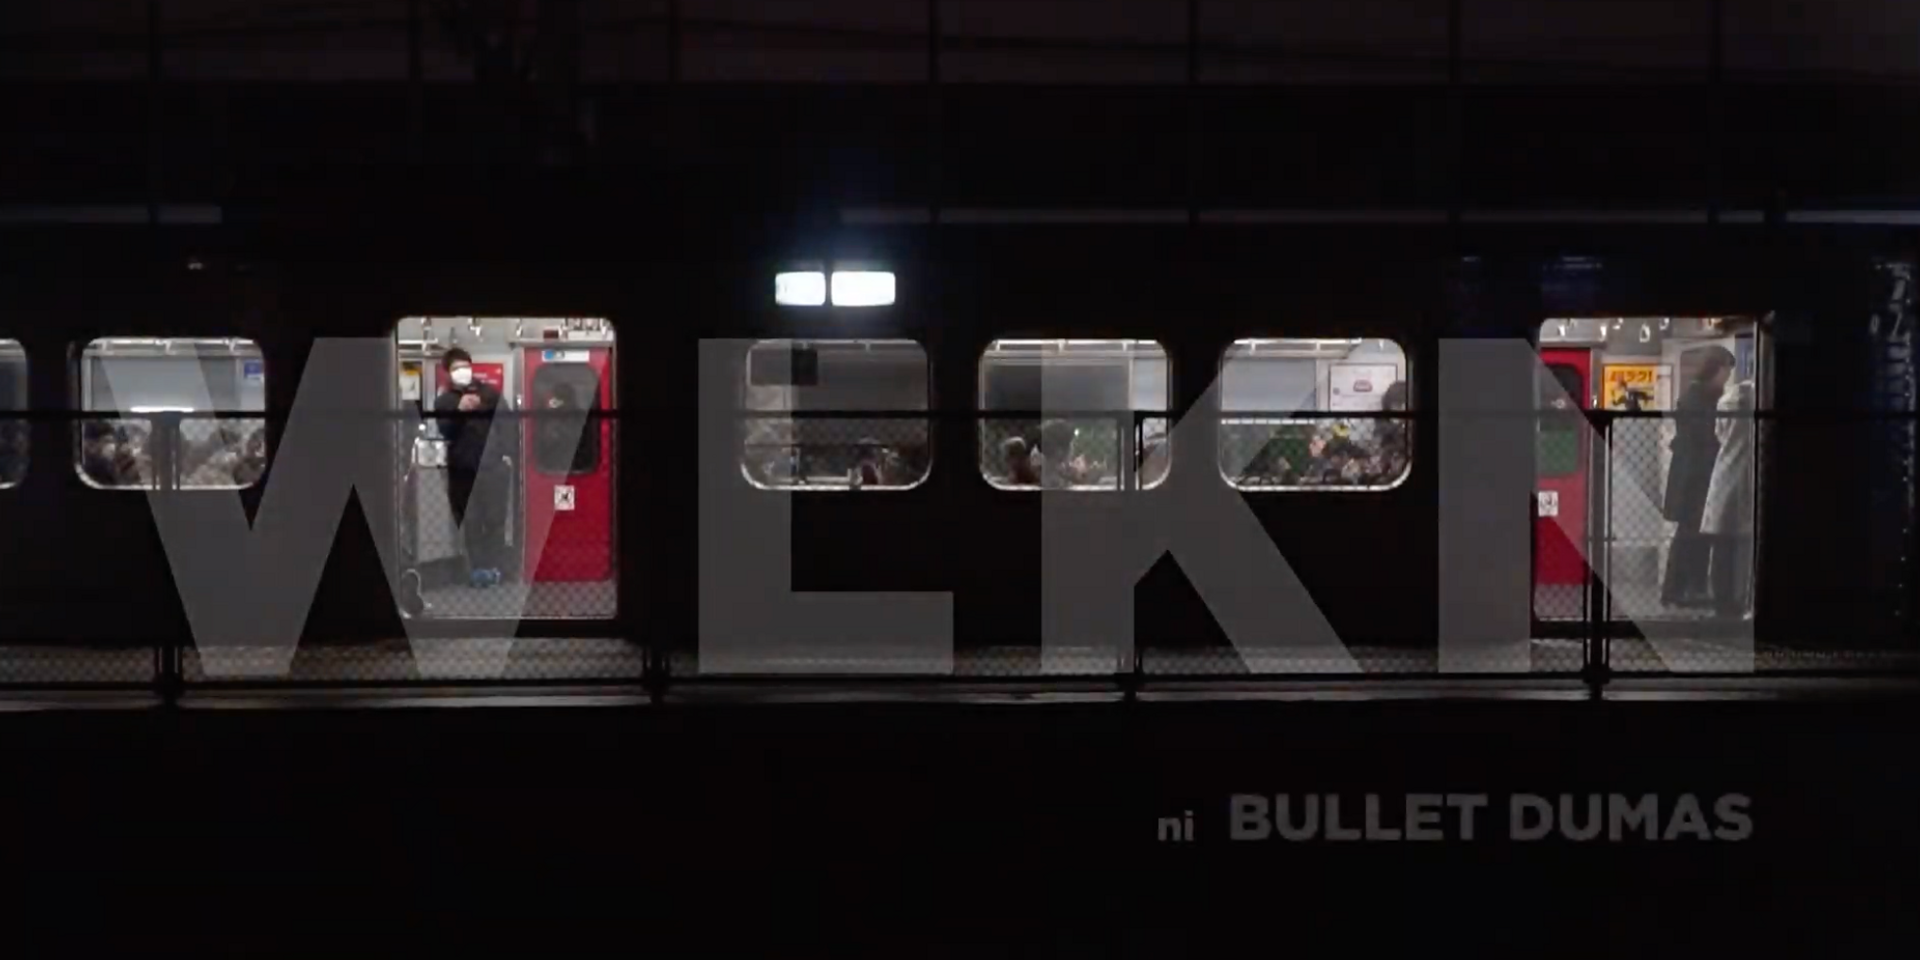 Bullet Dumas returns with surprise music video, 'WLKN' – watch